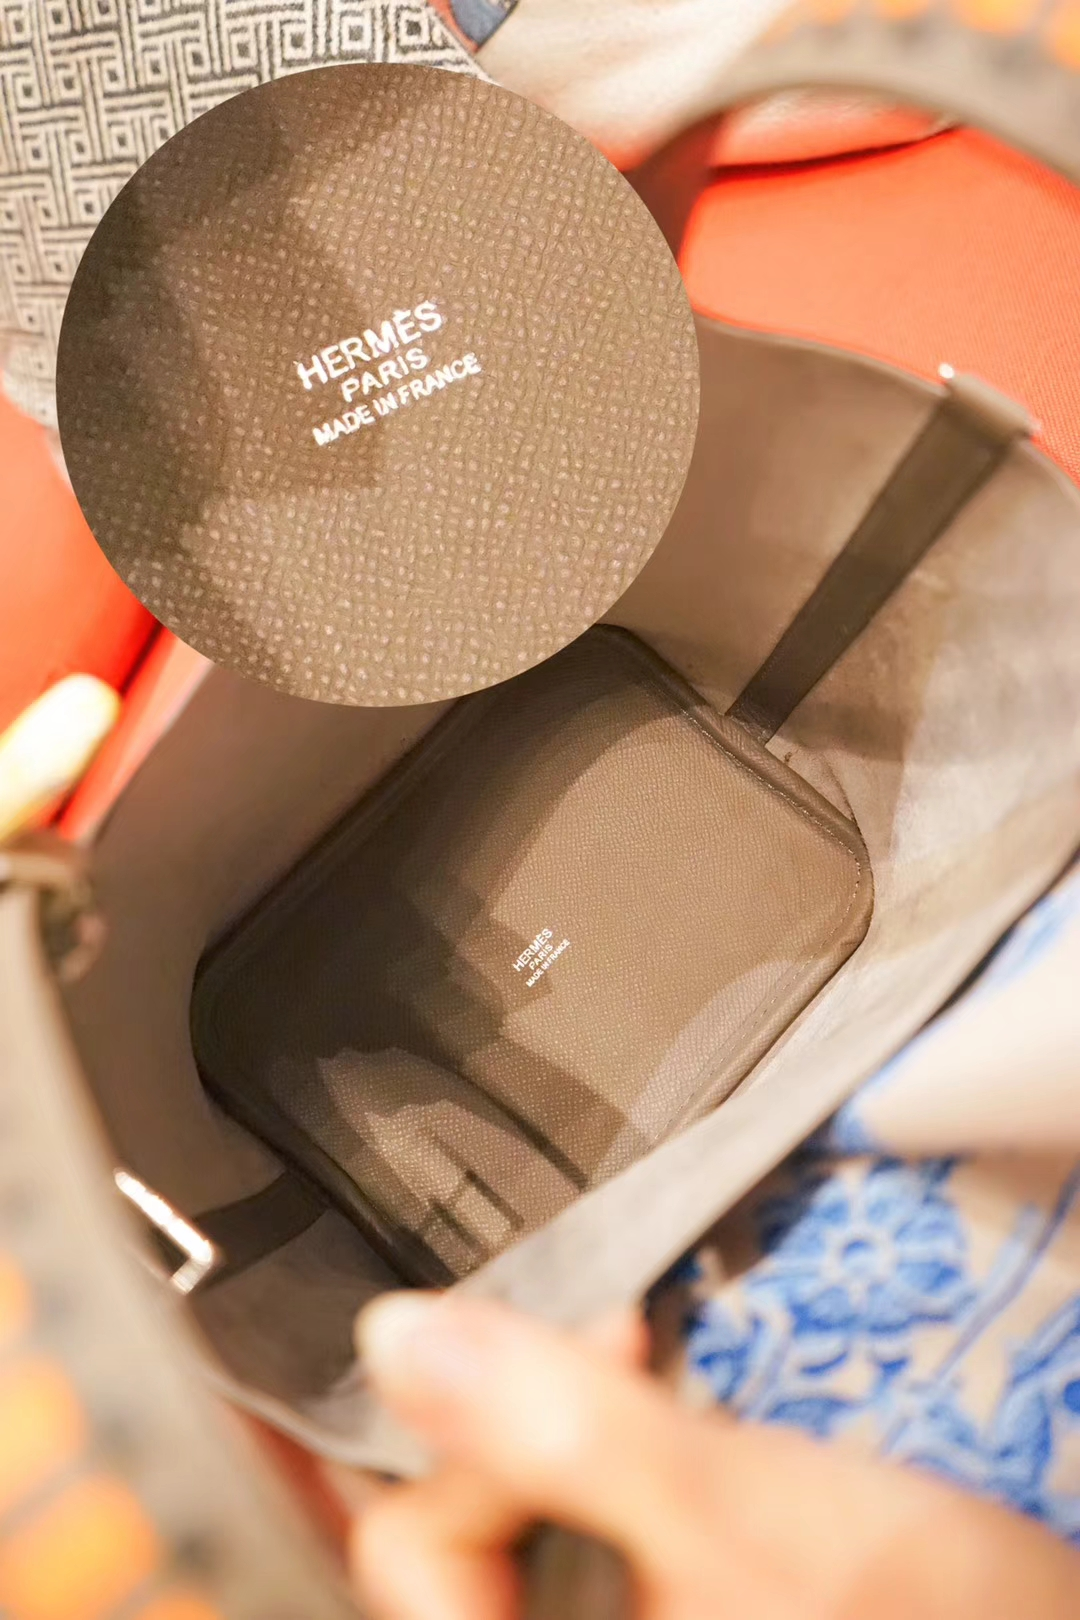 Hermès(爱马仕)Picotin菜篮包 大象灰 编织手柄 epsom皮 银扣 18cm